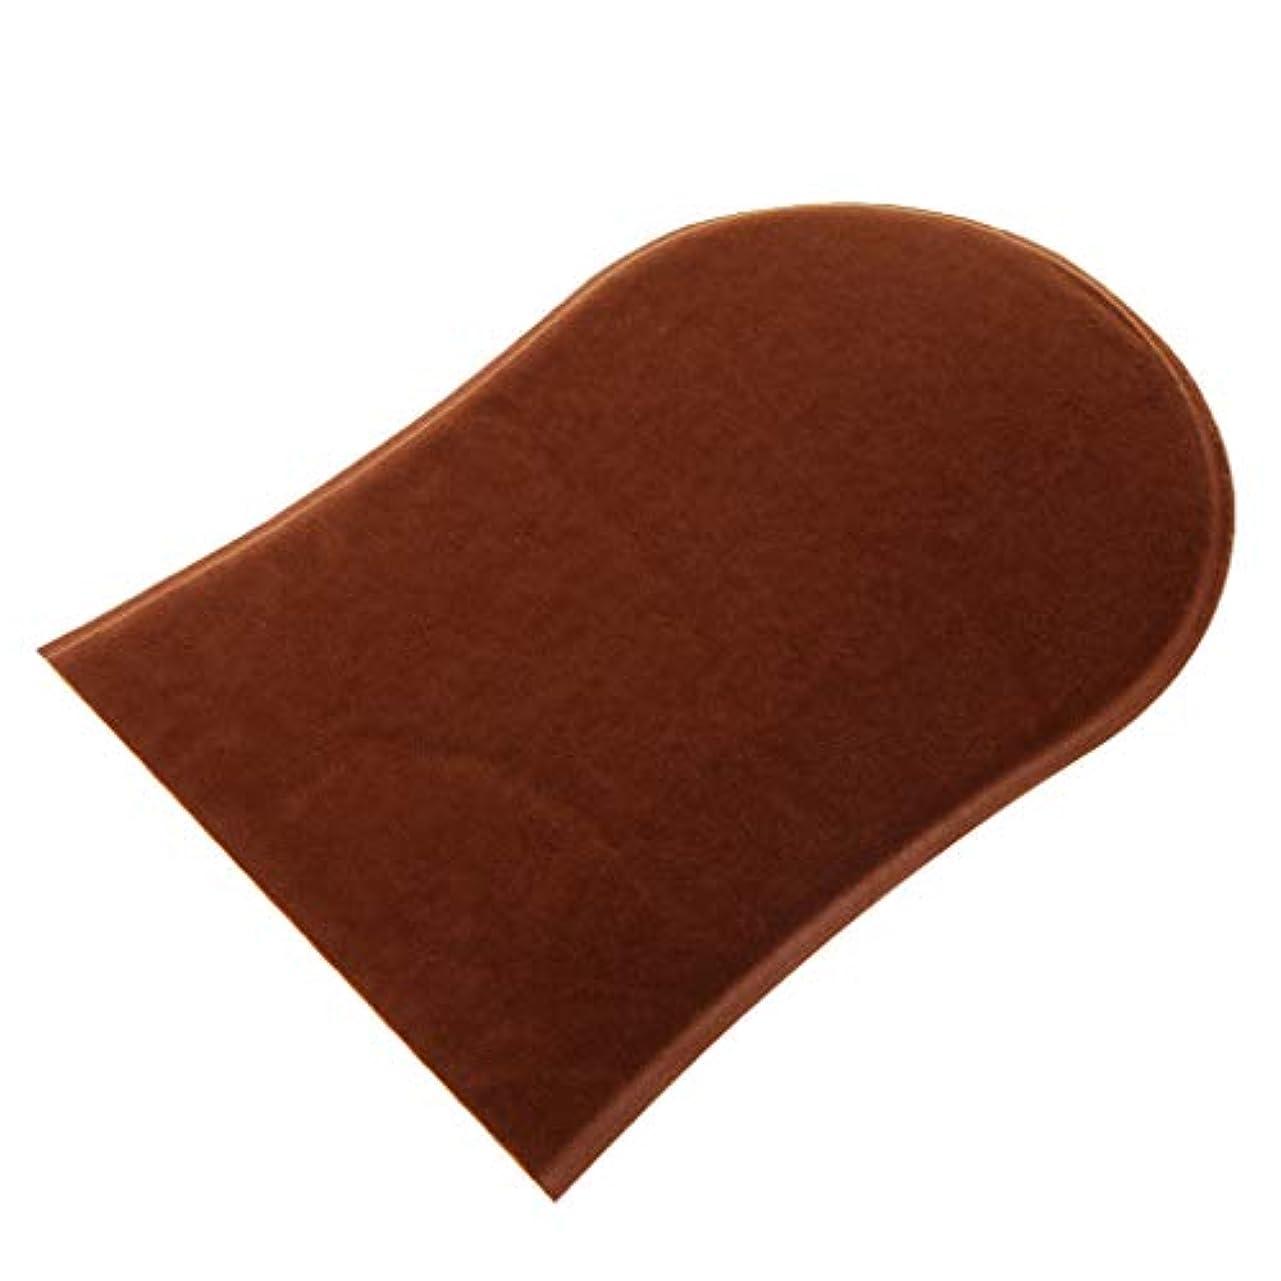 Sharplace 手袋 グローブ ハンドケア セルフタンニング 防水 再利用可能 両面 約19*12cm